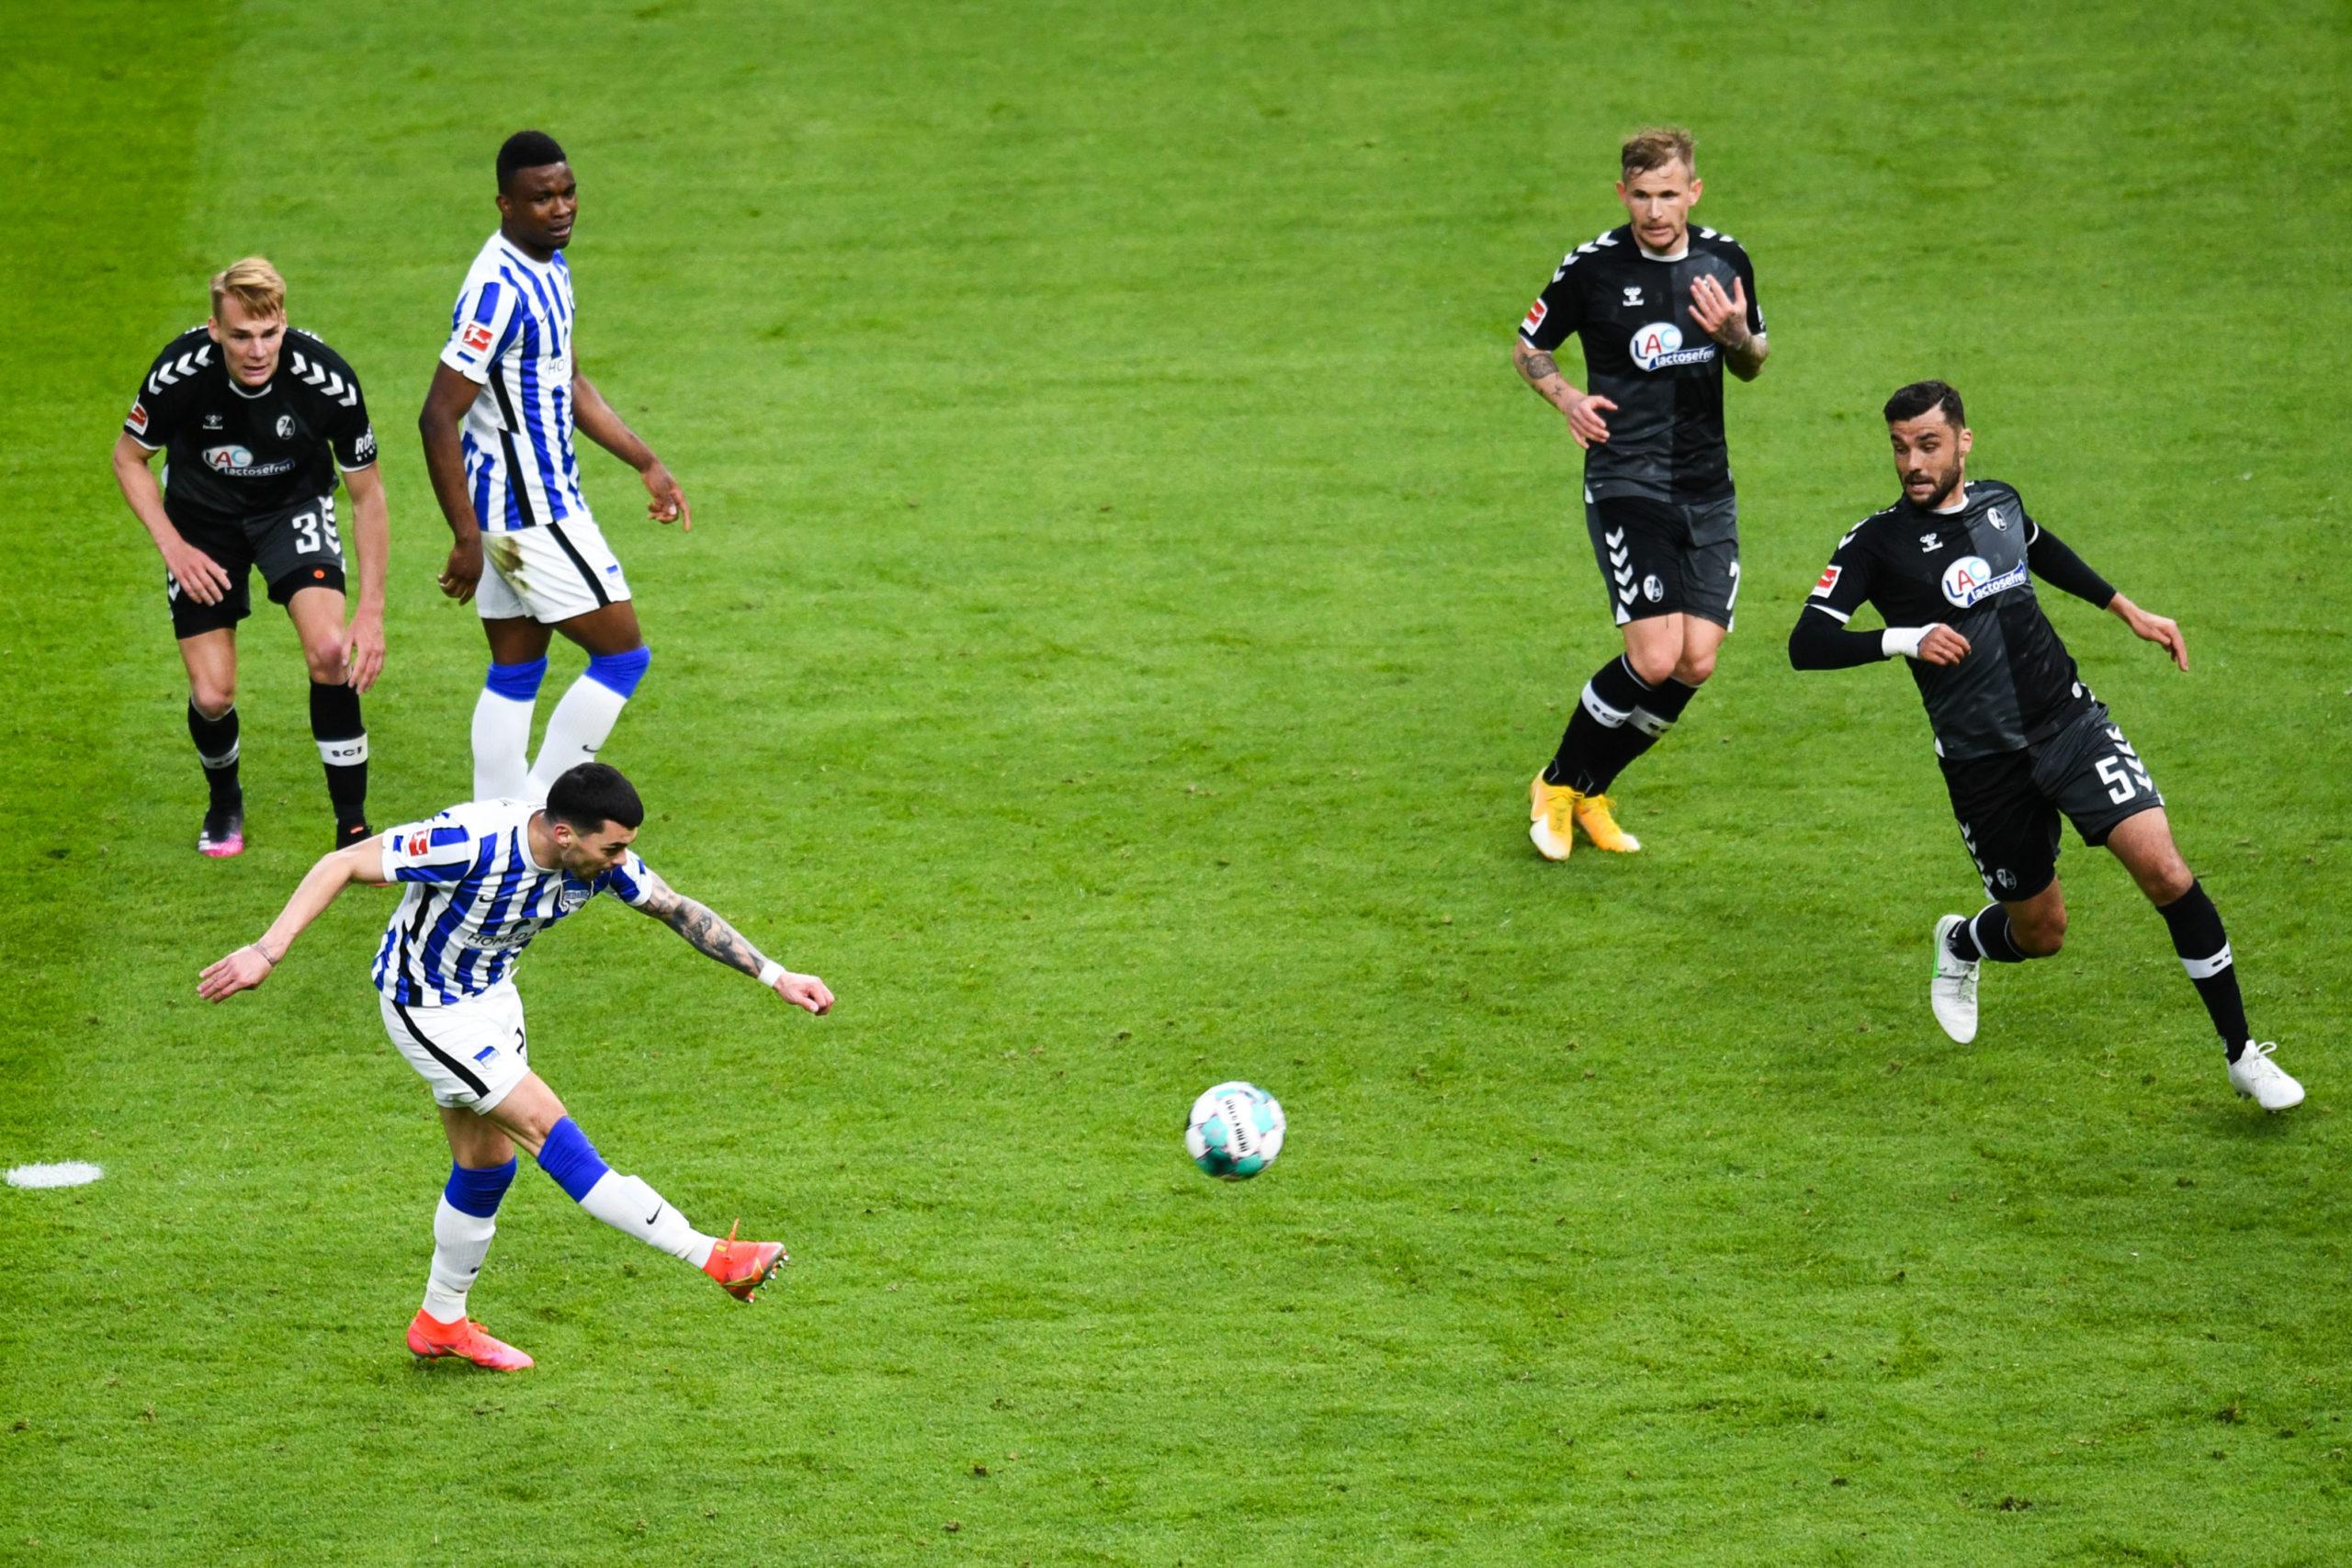 OM - Nemanja Radonjic marque un joli premier but avec le Hertha Berlin